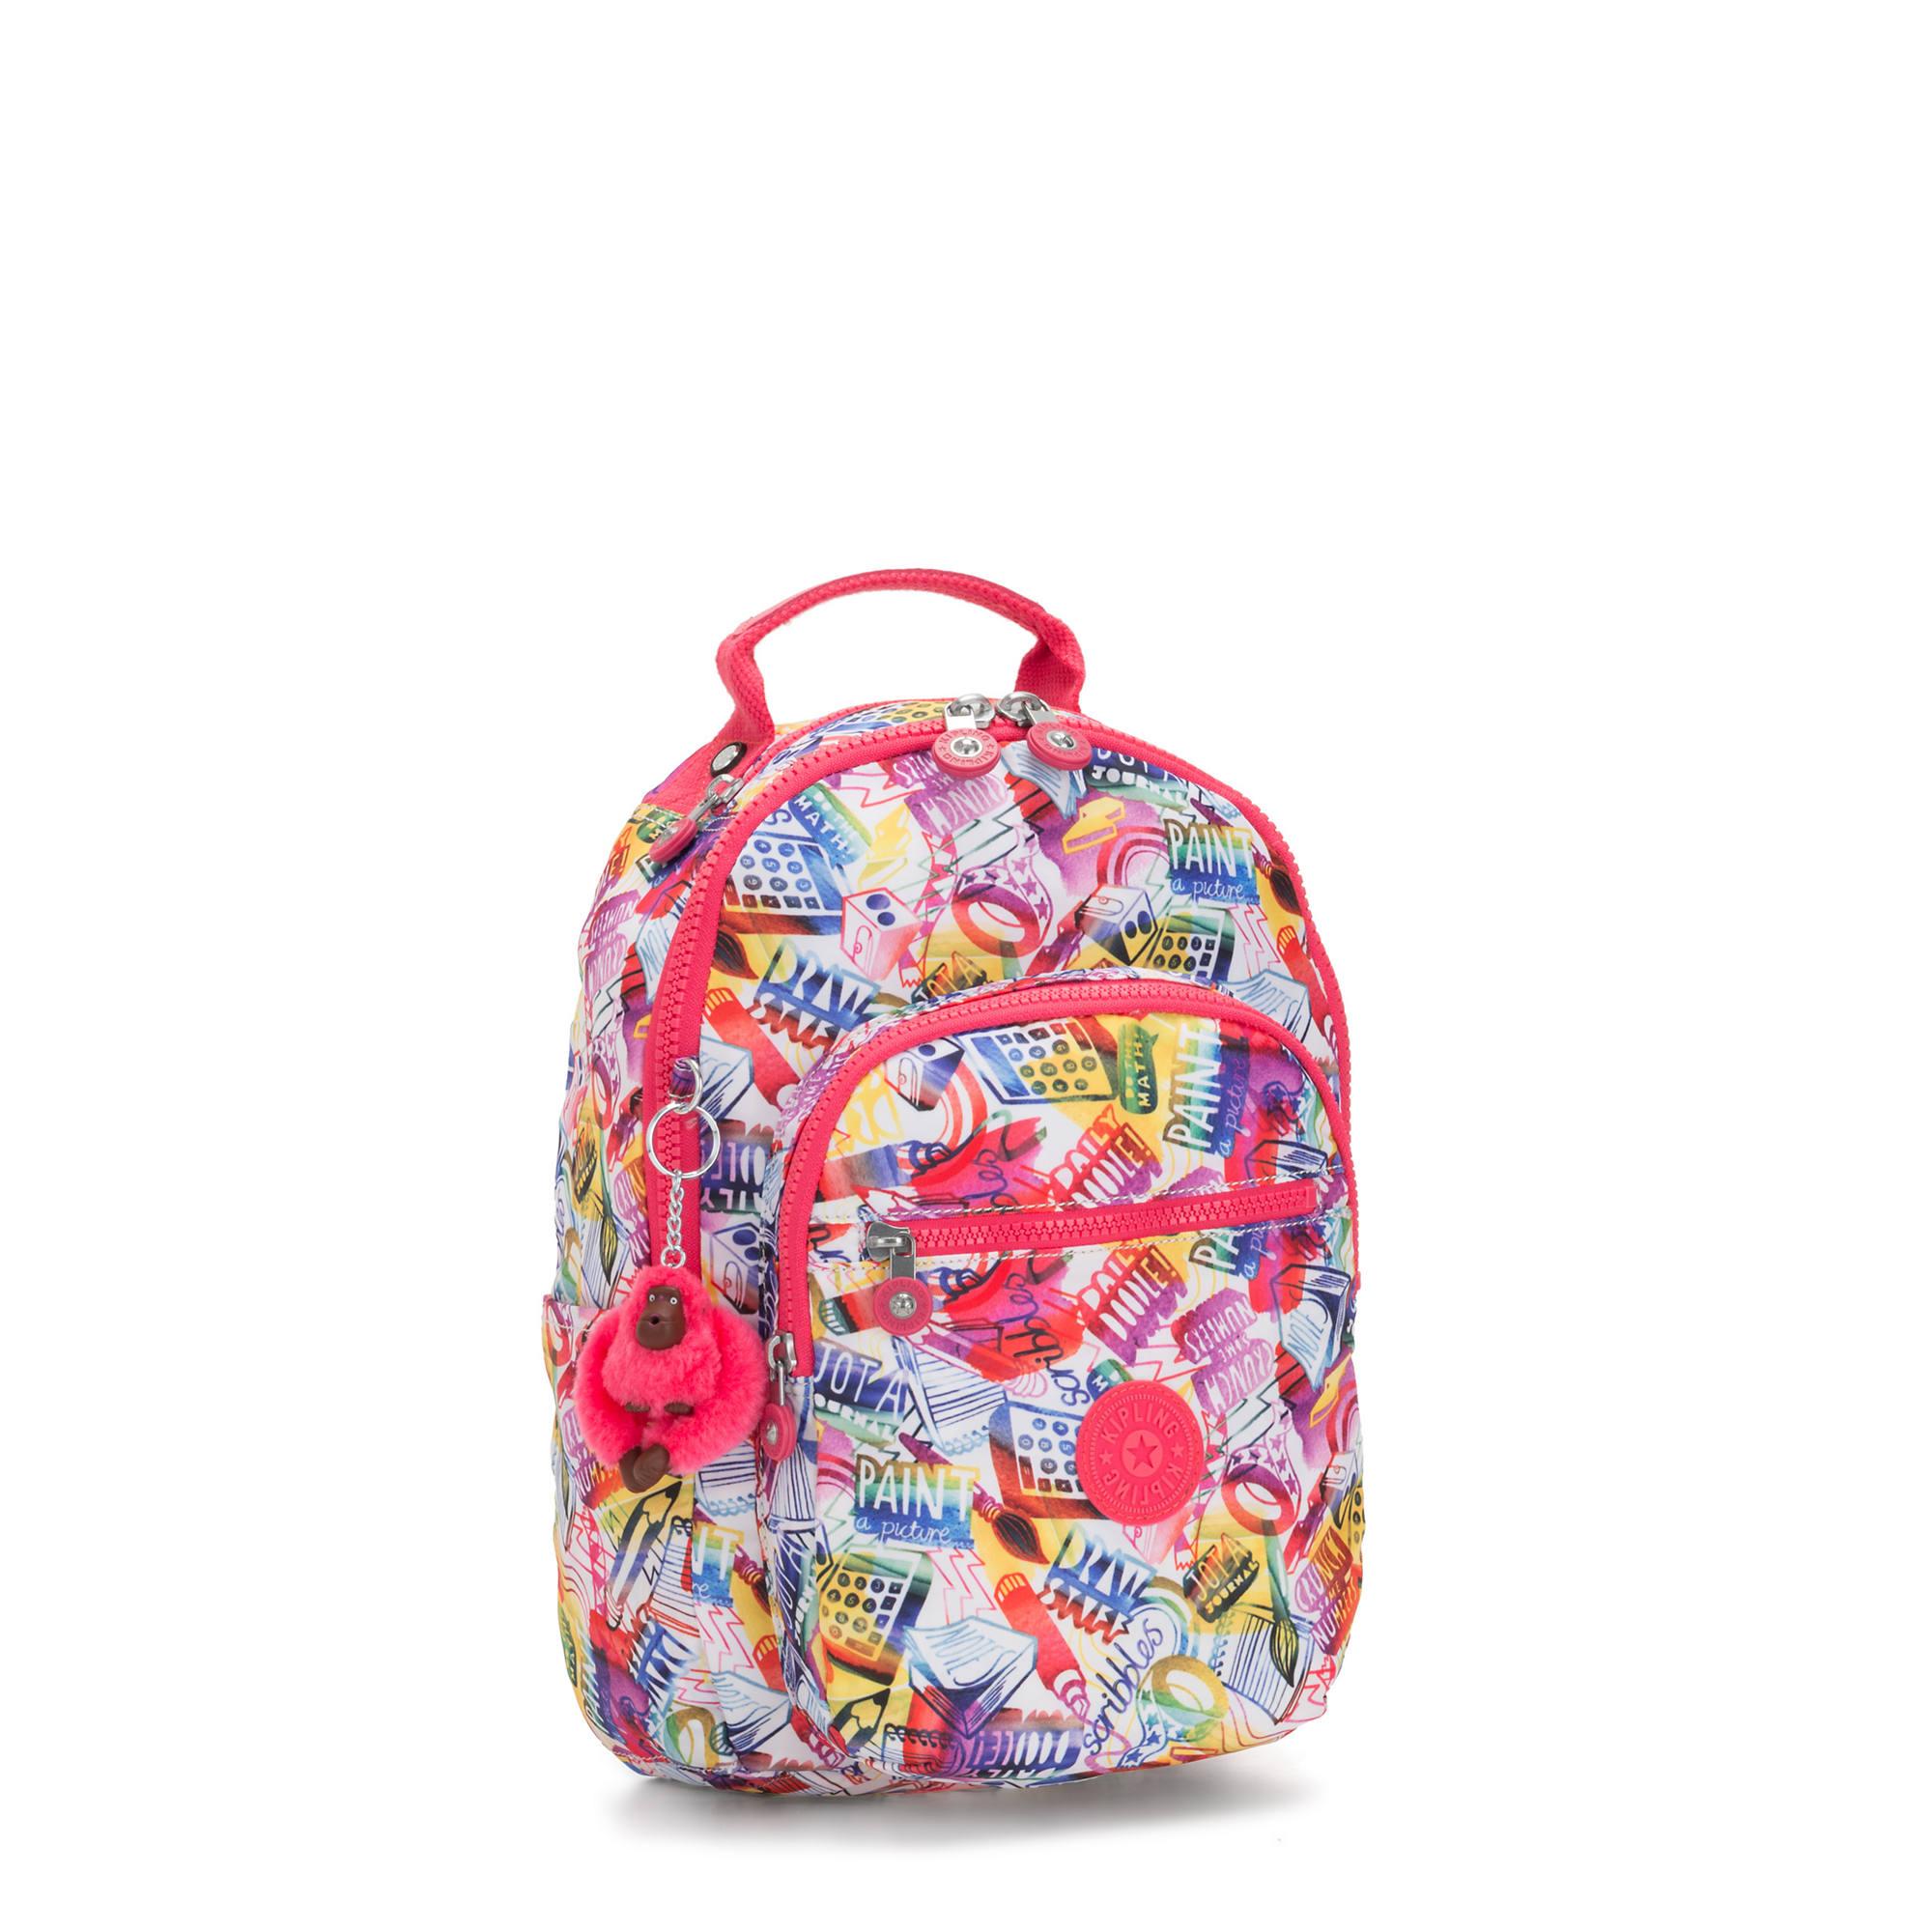 Kipling-Seoul-Small-11-034-Laptop-Backpack thumbnail 26